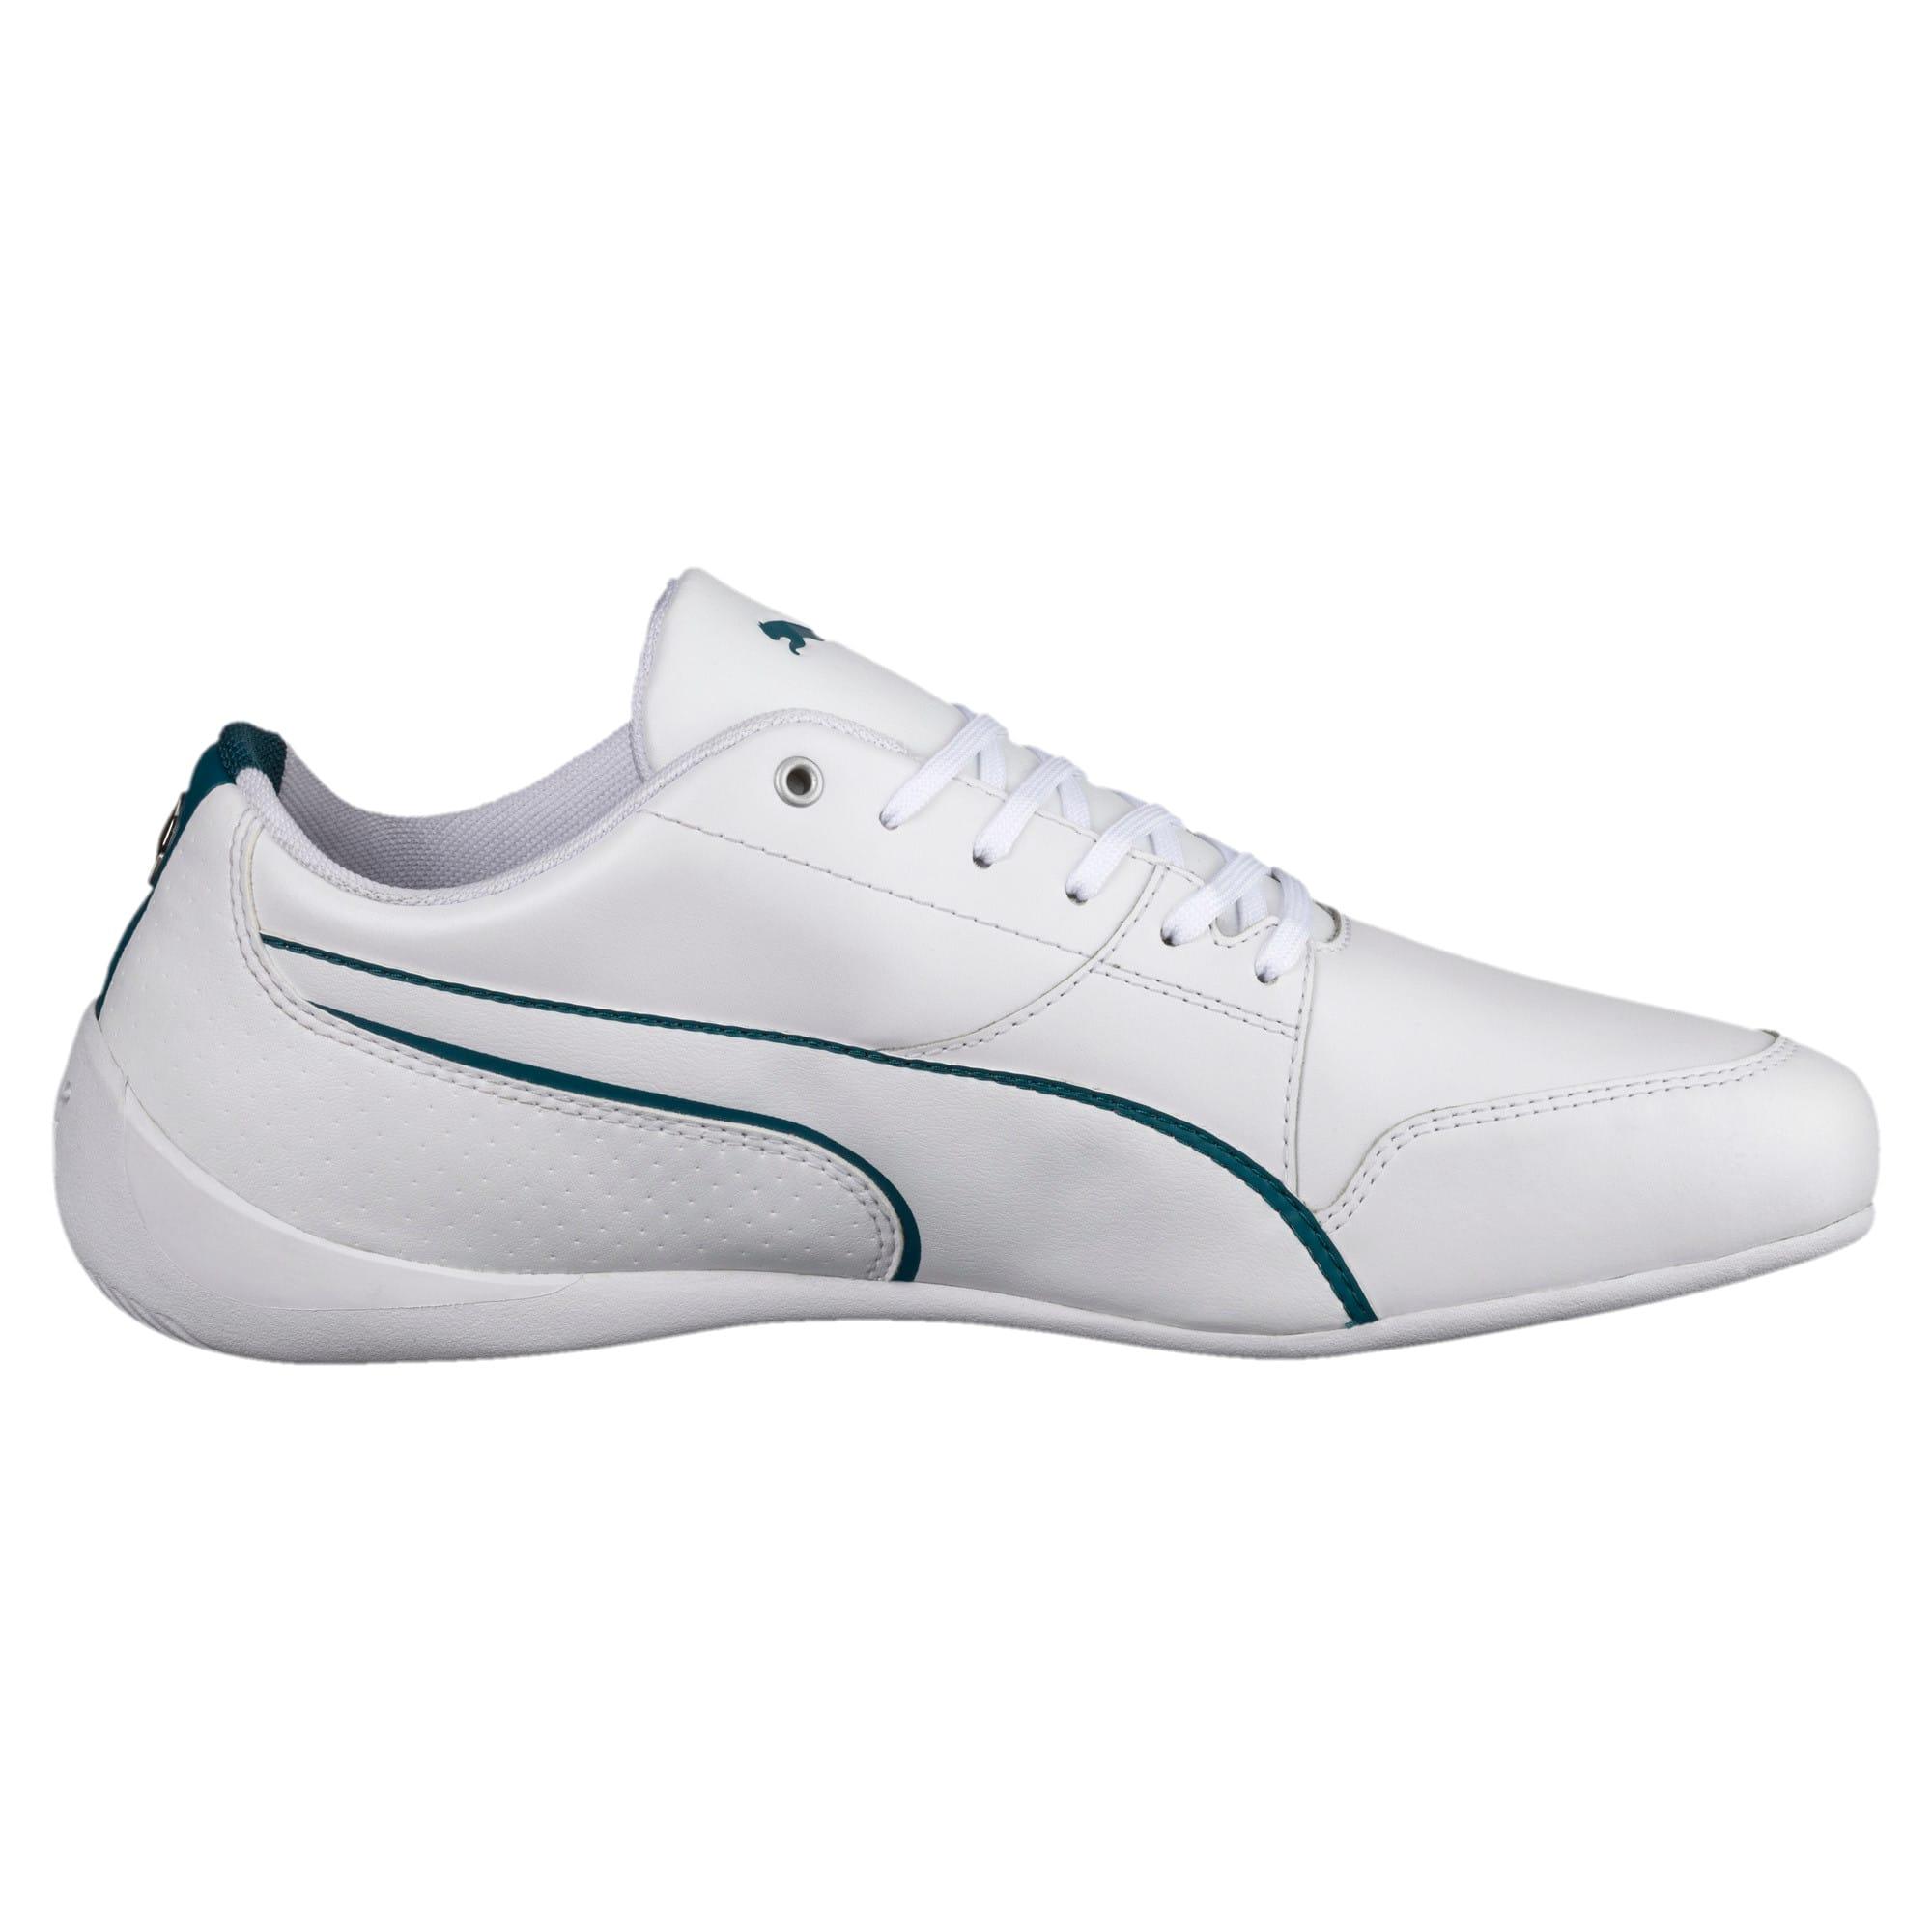 Thumbnail 3 of Mercedes AMG Petronas Motorsport Drift Cat 7 Shoes, Puma White-Puma White, medium